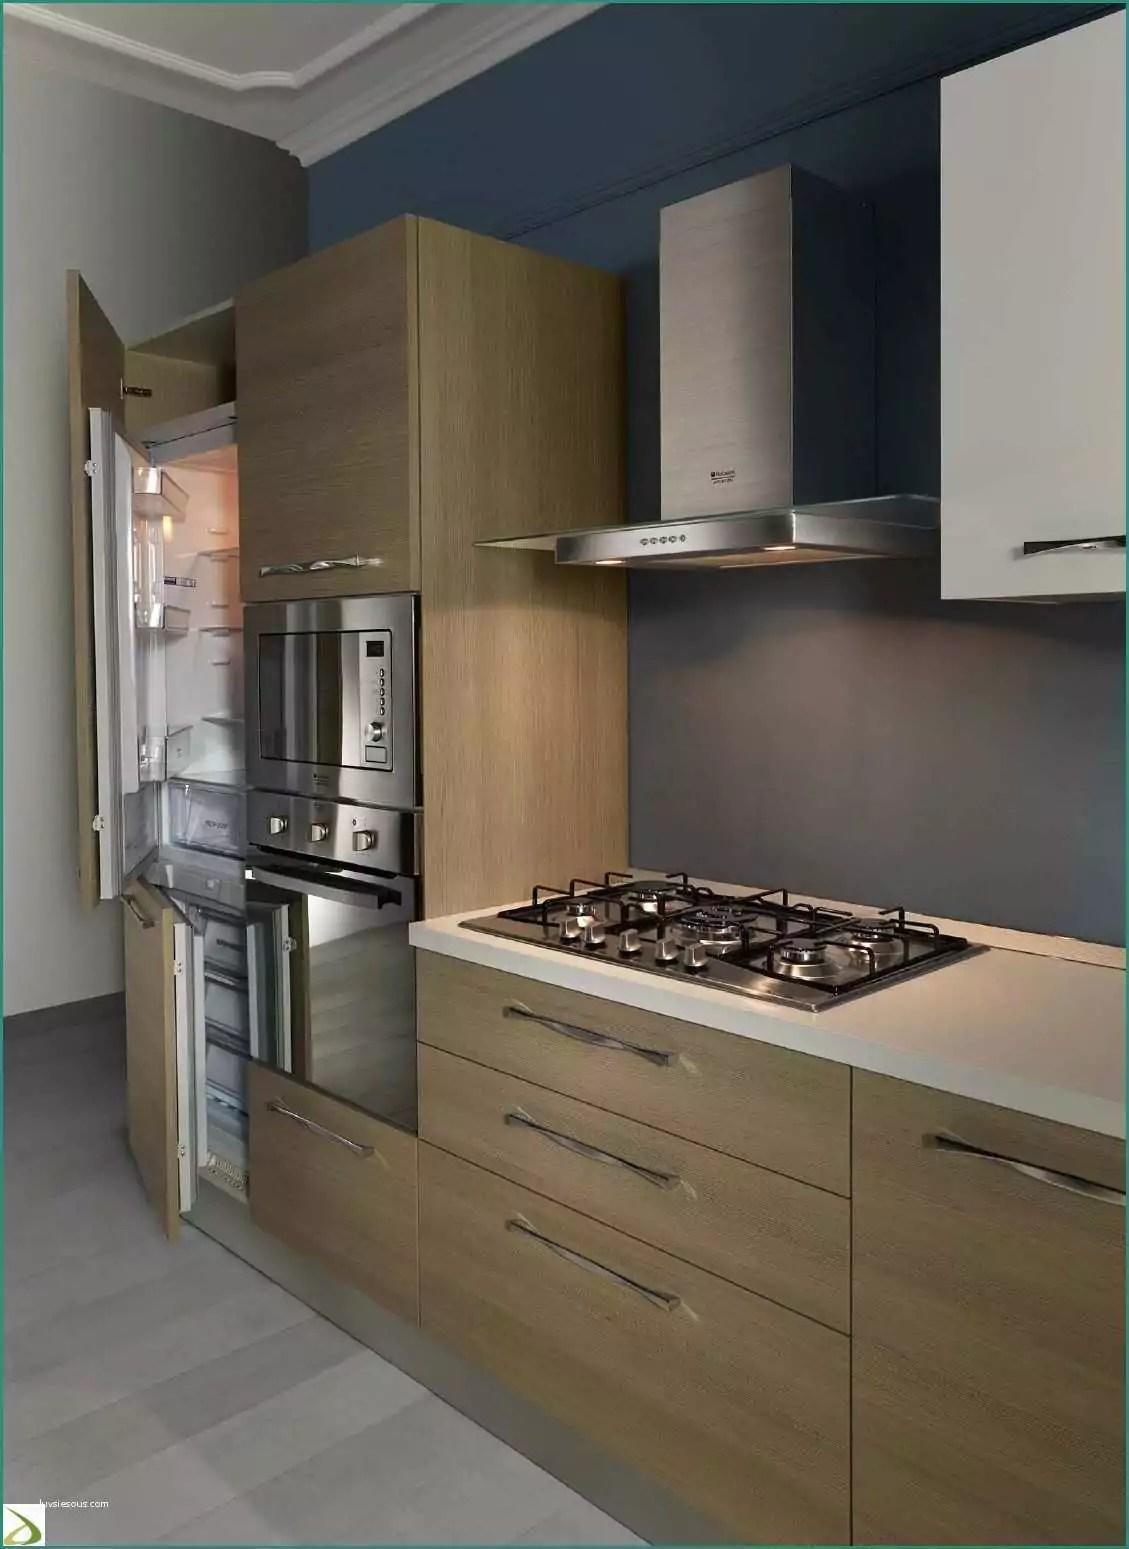 Cucina Scavolini Vendita On Line | Cucine Monza Brianza Carate ...